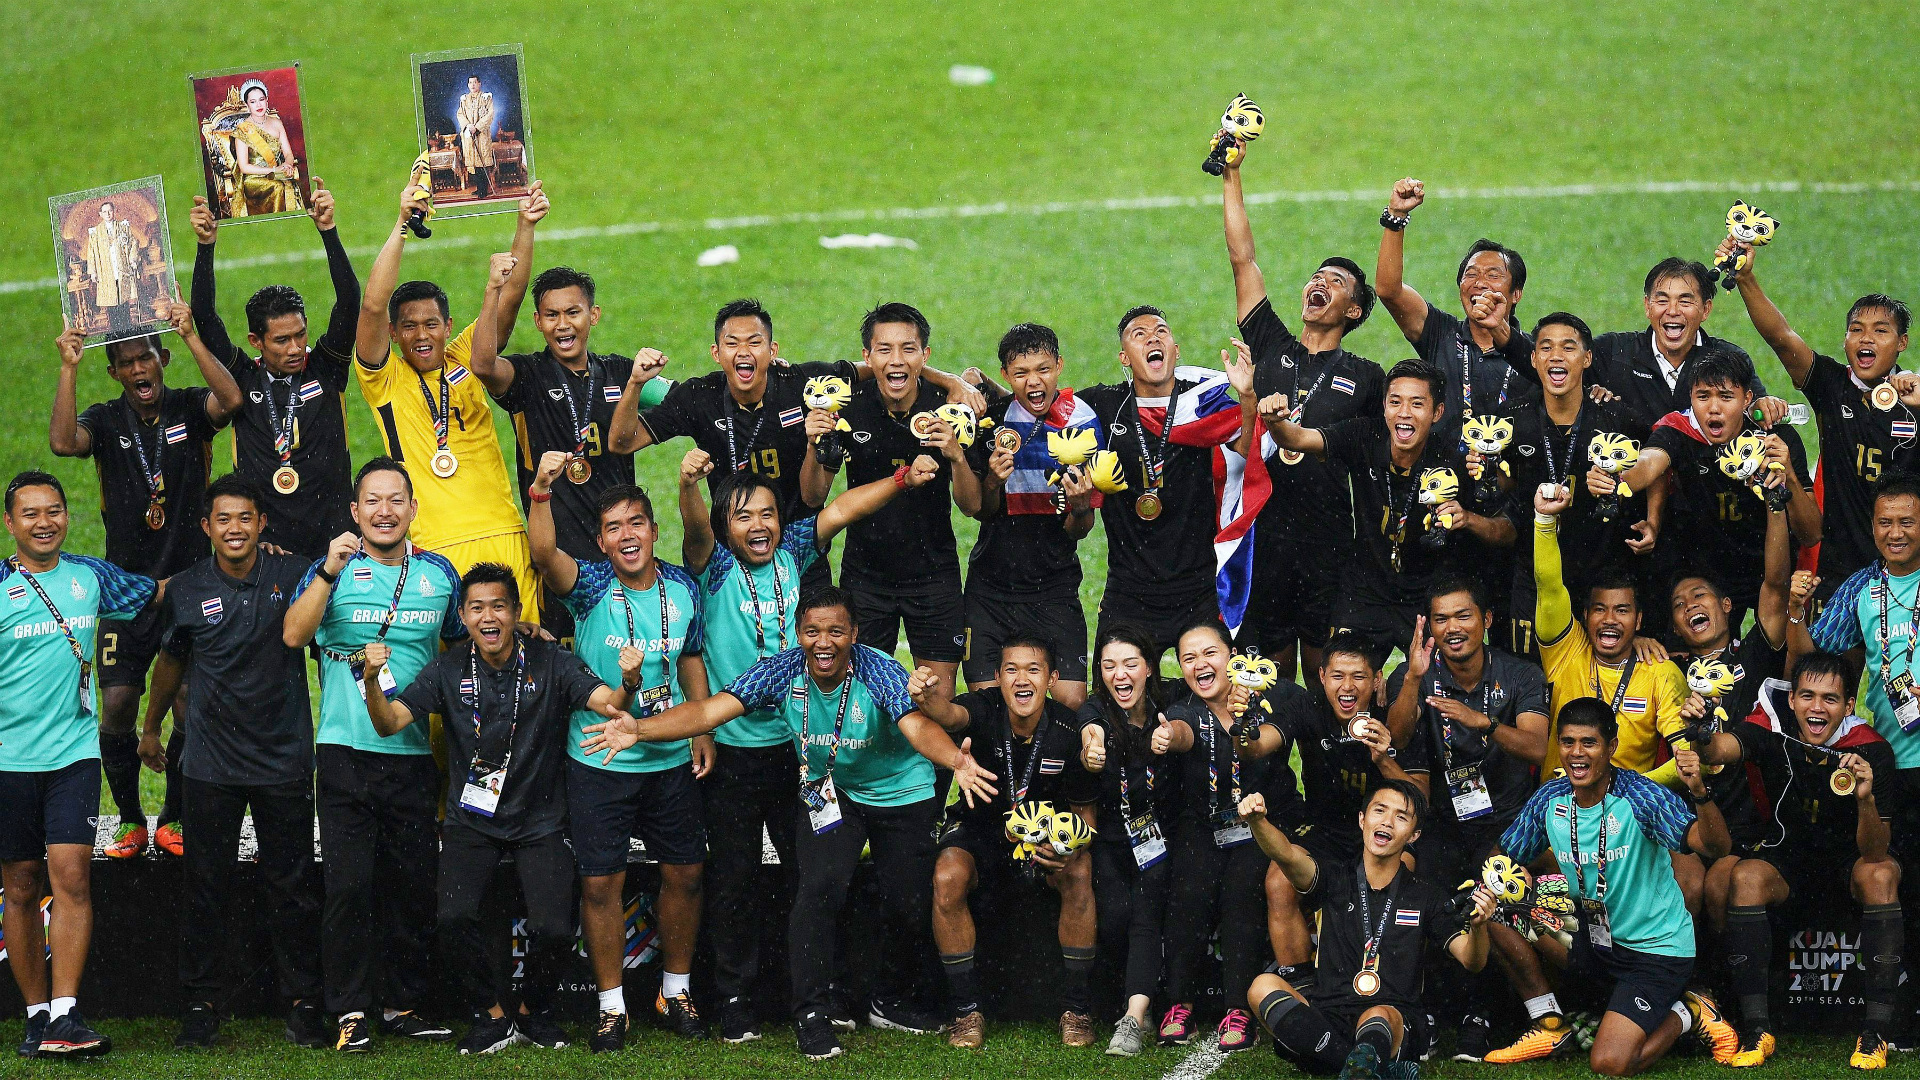 Kuala Lumpur 2017: A successful SEA Games for Vietnam